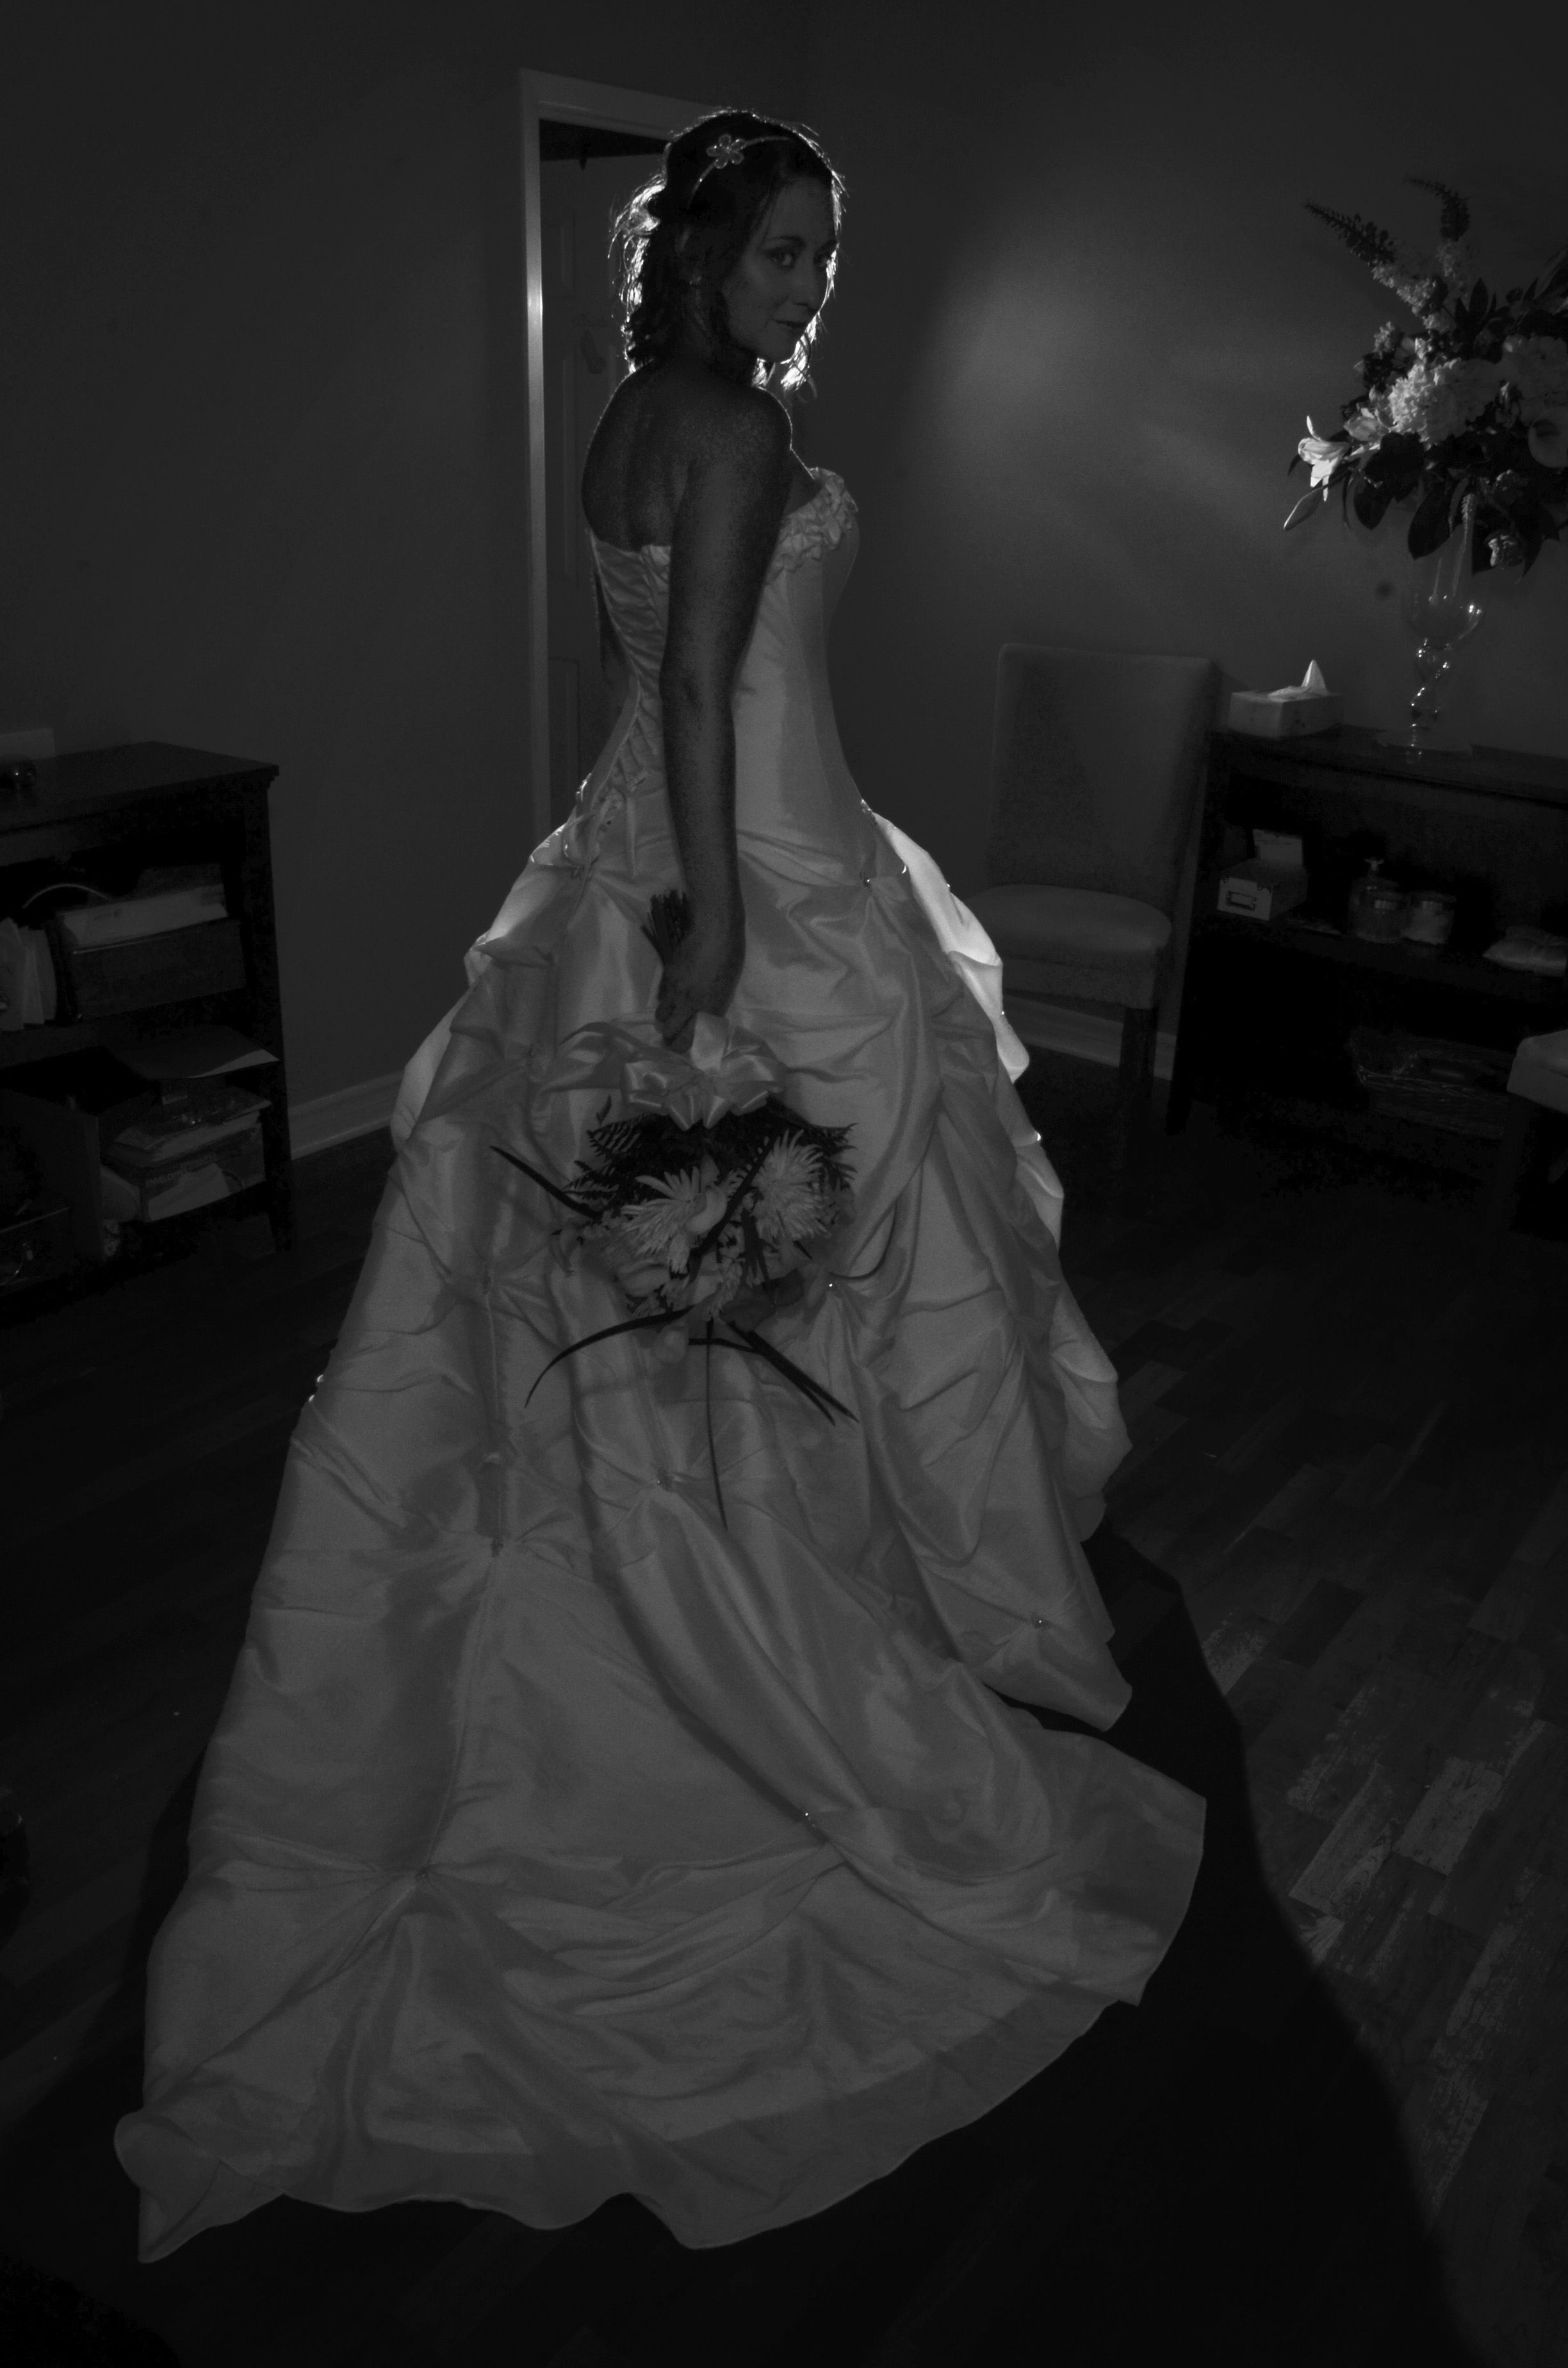 Black white wedding dress  llyharperphotography Bride Wedding Photography Wedding